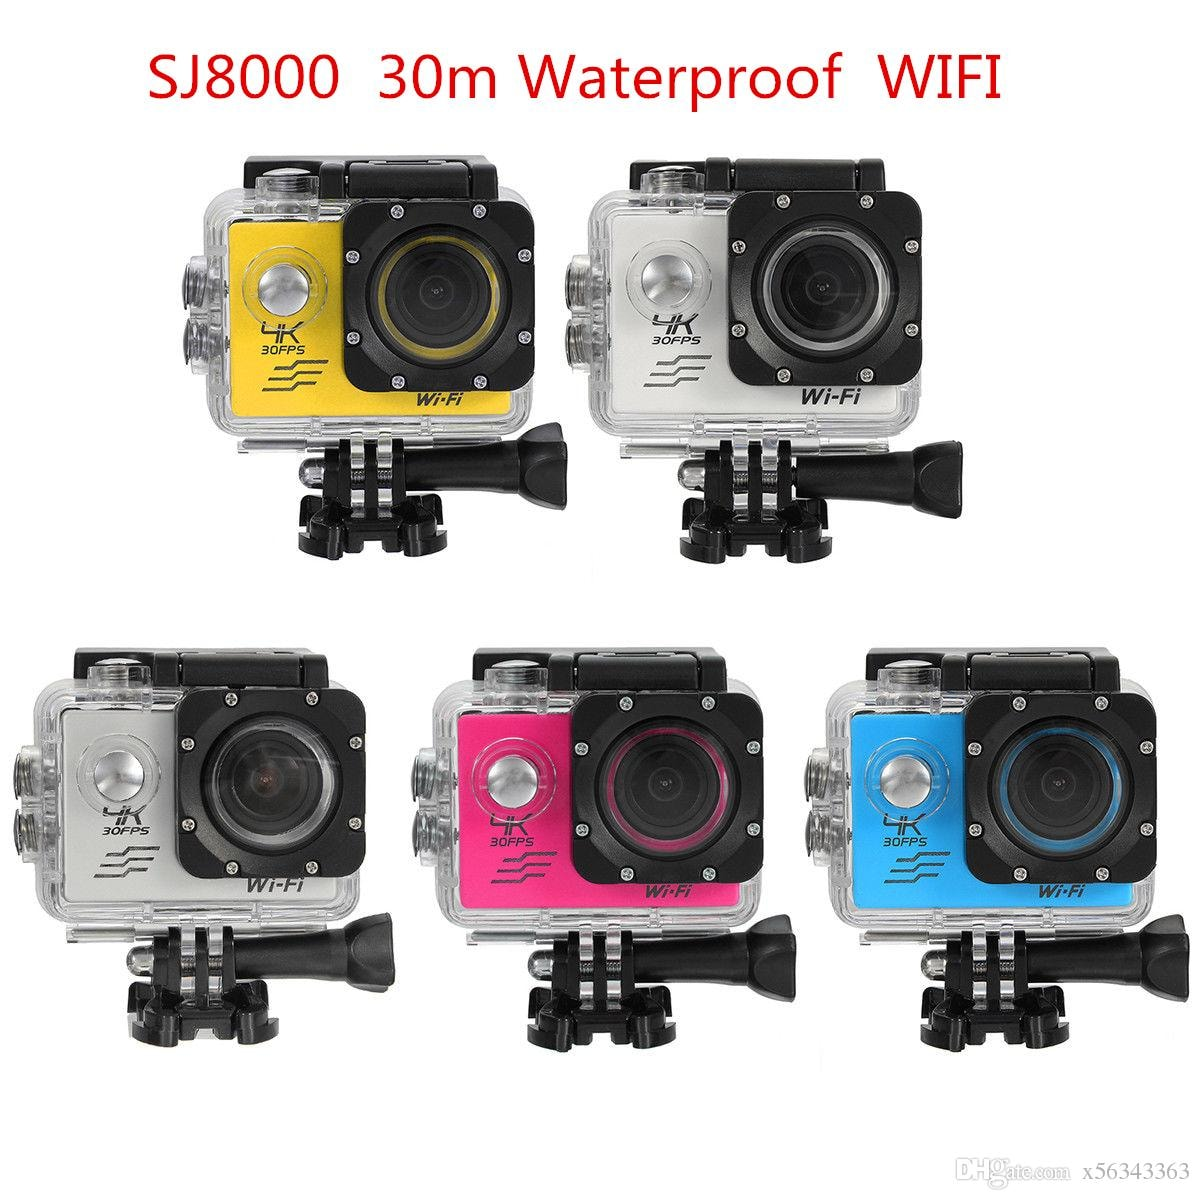 SJ8000 2.0 Inch Sport Action Camera - HD 4K 1080P, Wifi, DV 170 Degree Wide Angle Lens, 30M Waterproof, Remote Yellow - 1